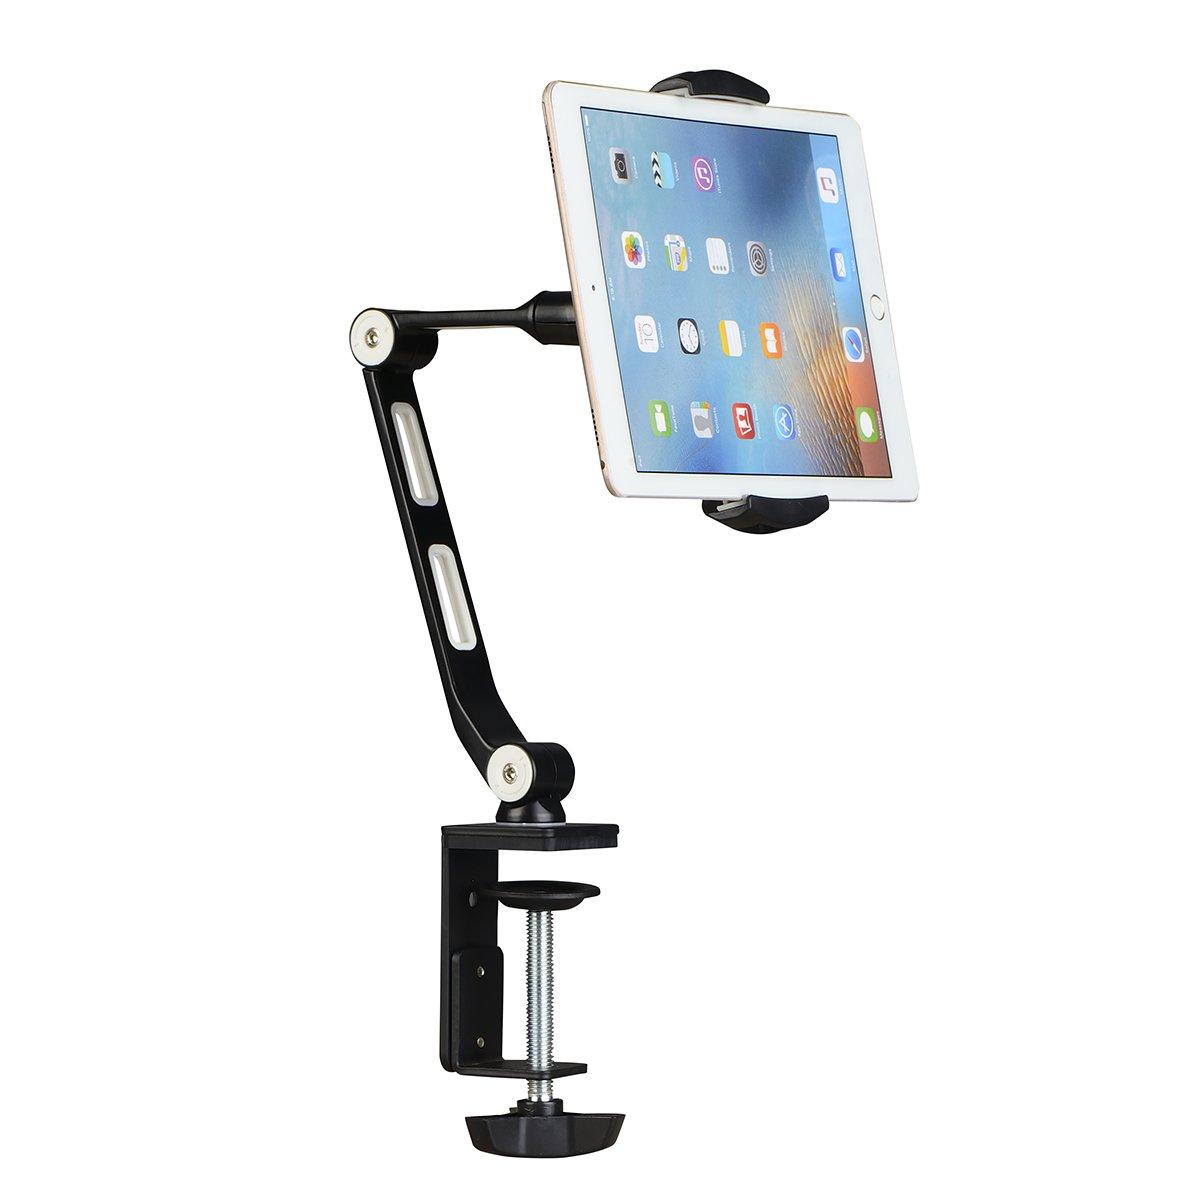 suptek Aluminum Tablet Desk Mount Stand 360° Flexible Cell Phone Holder, $23.99 - clip coupon